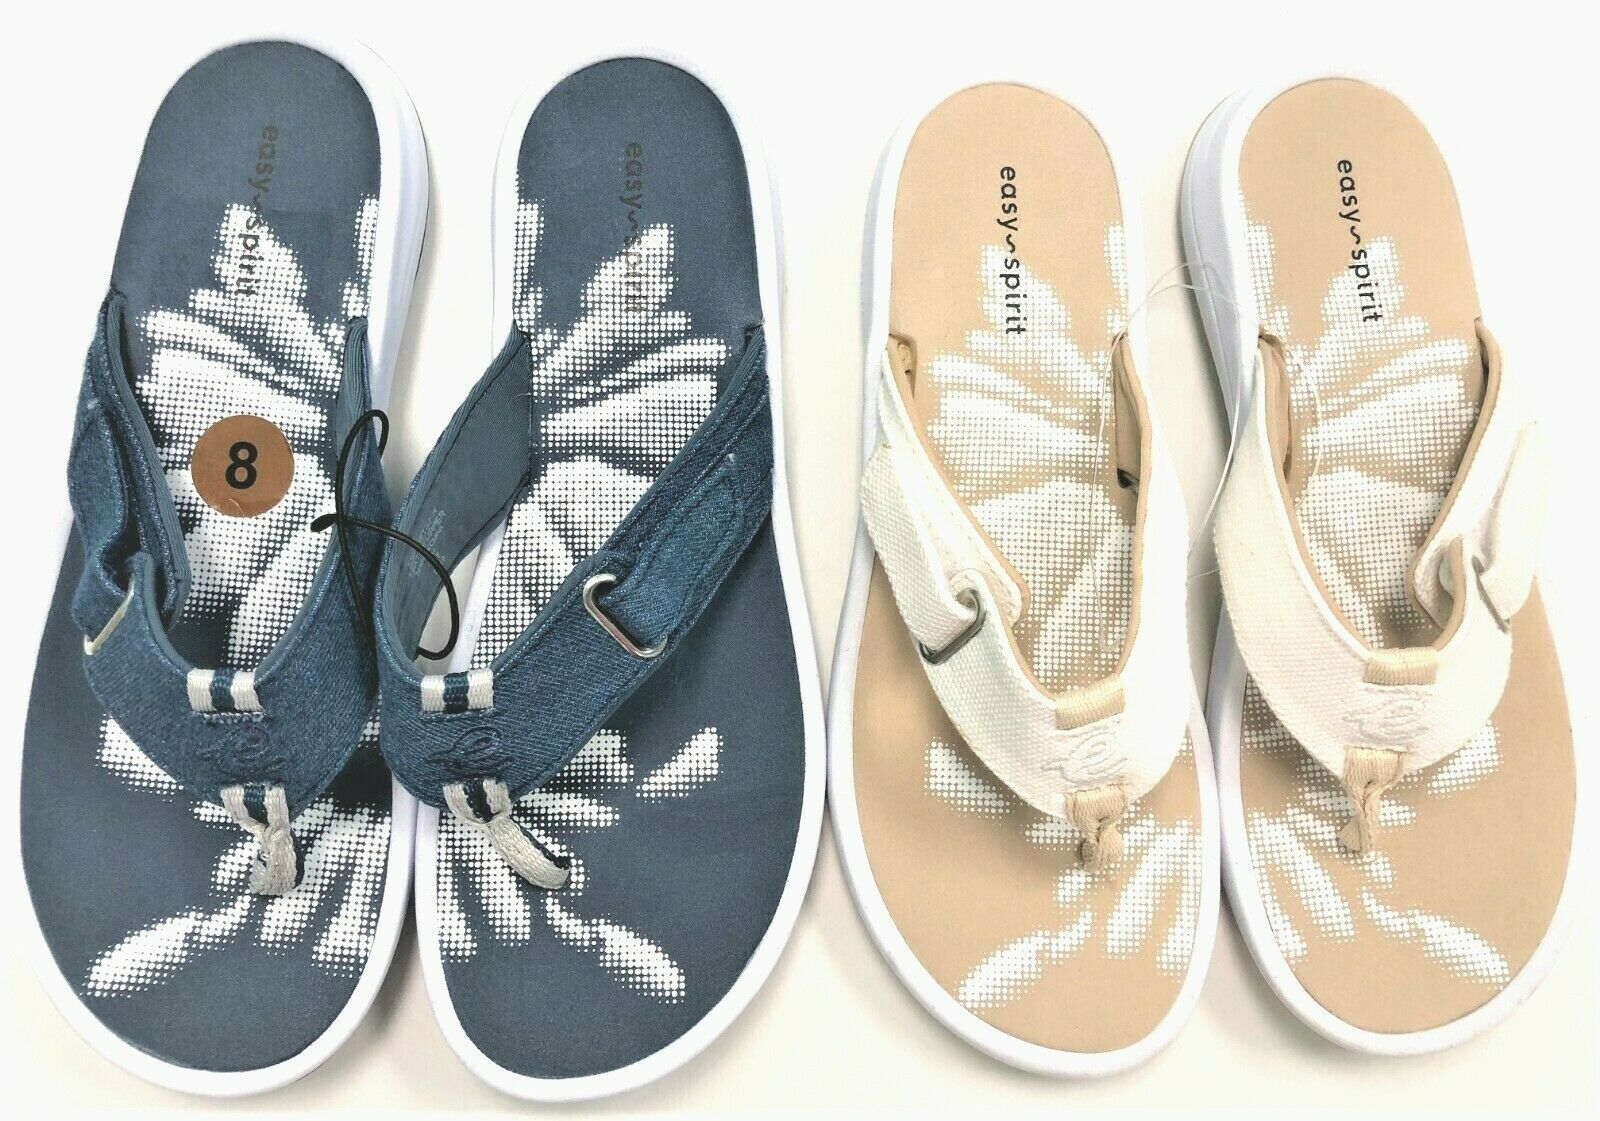 Easy Spirit Womens Drifts 7 Adjustable Strap Thong Flip Flop Sandals NEW $59 - $52.00